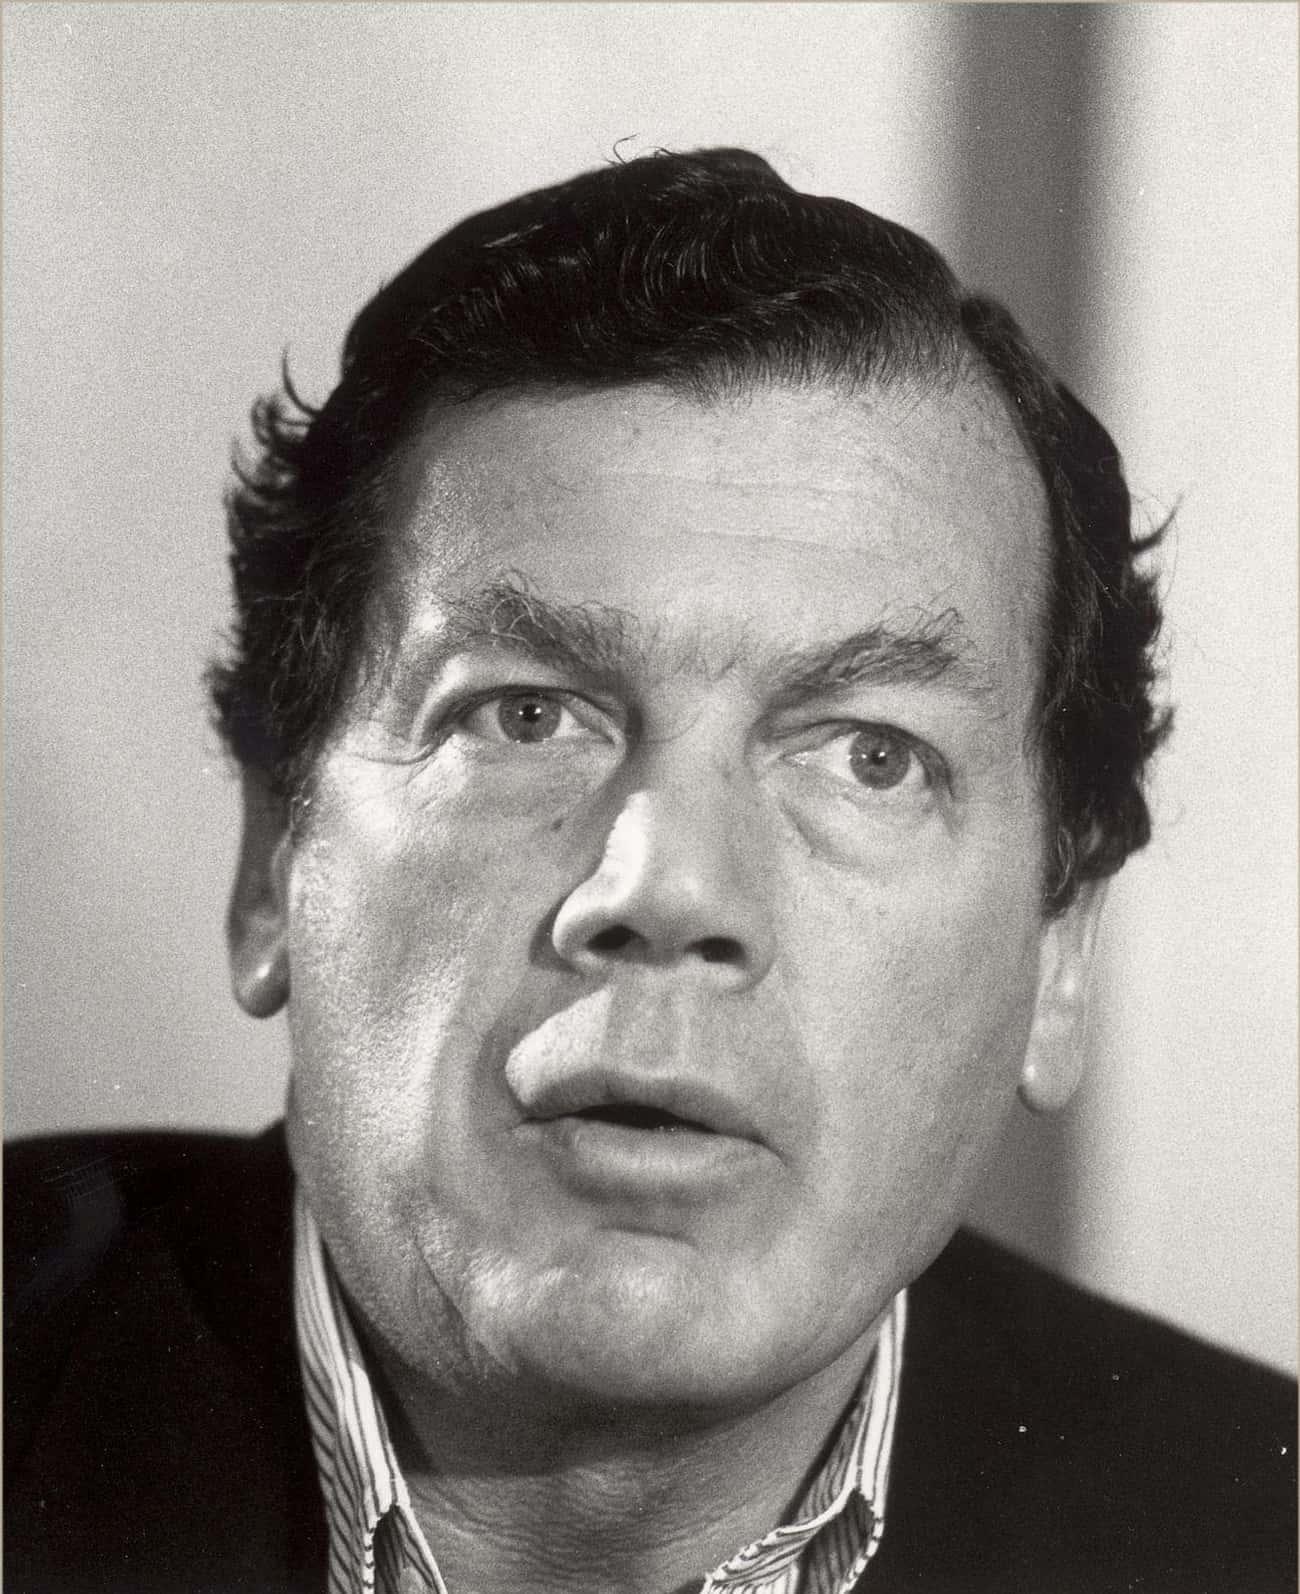 Edgar Bronfman, Sr.